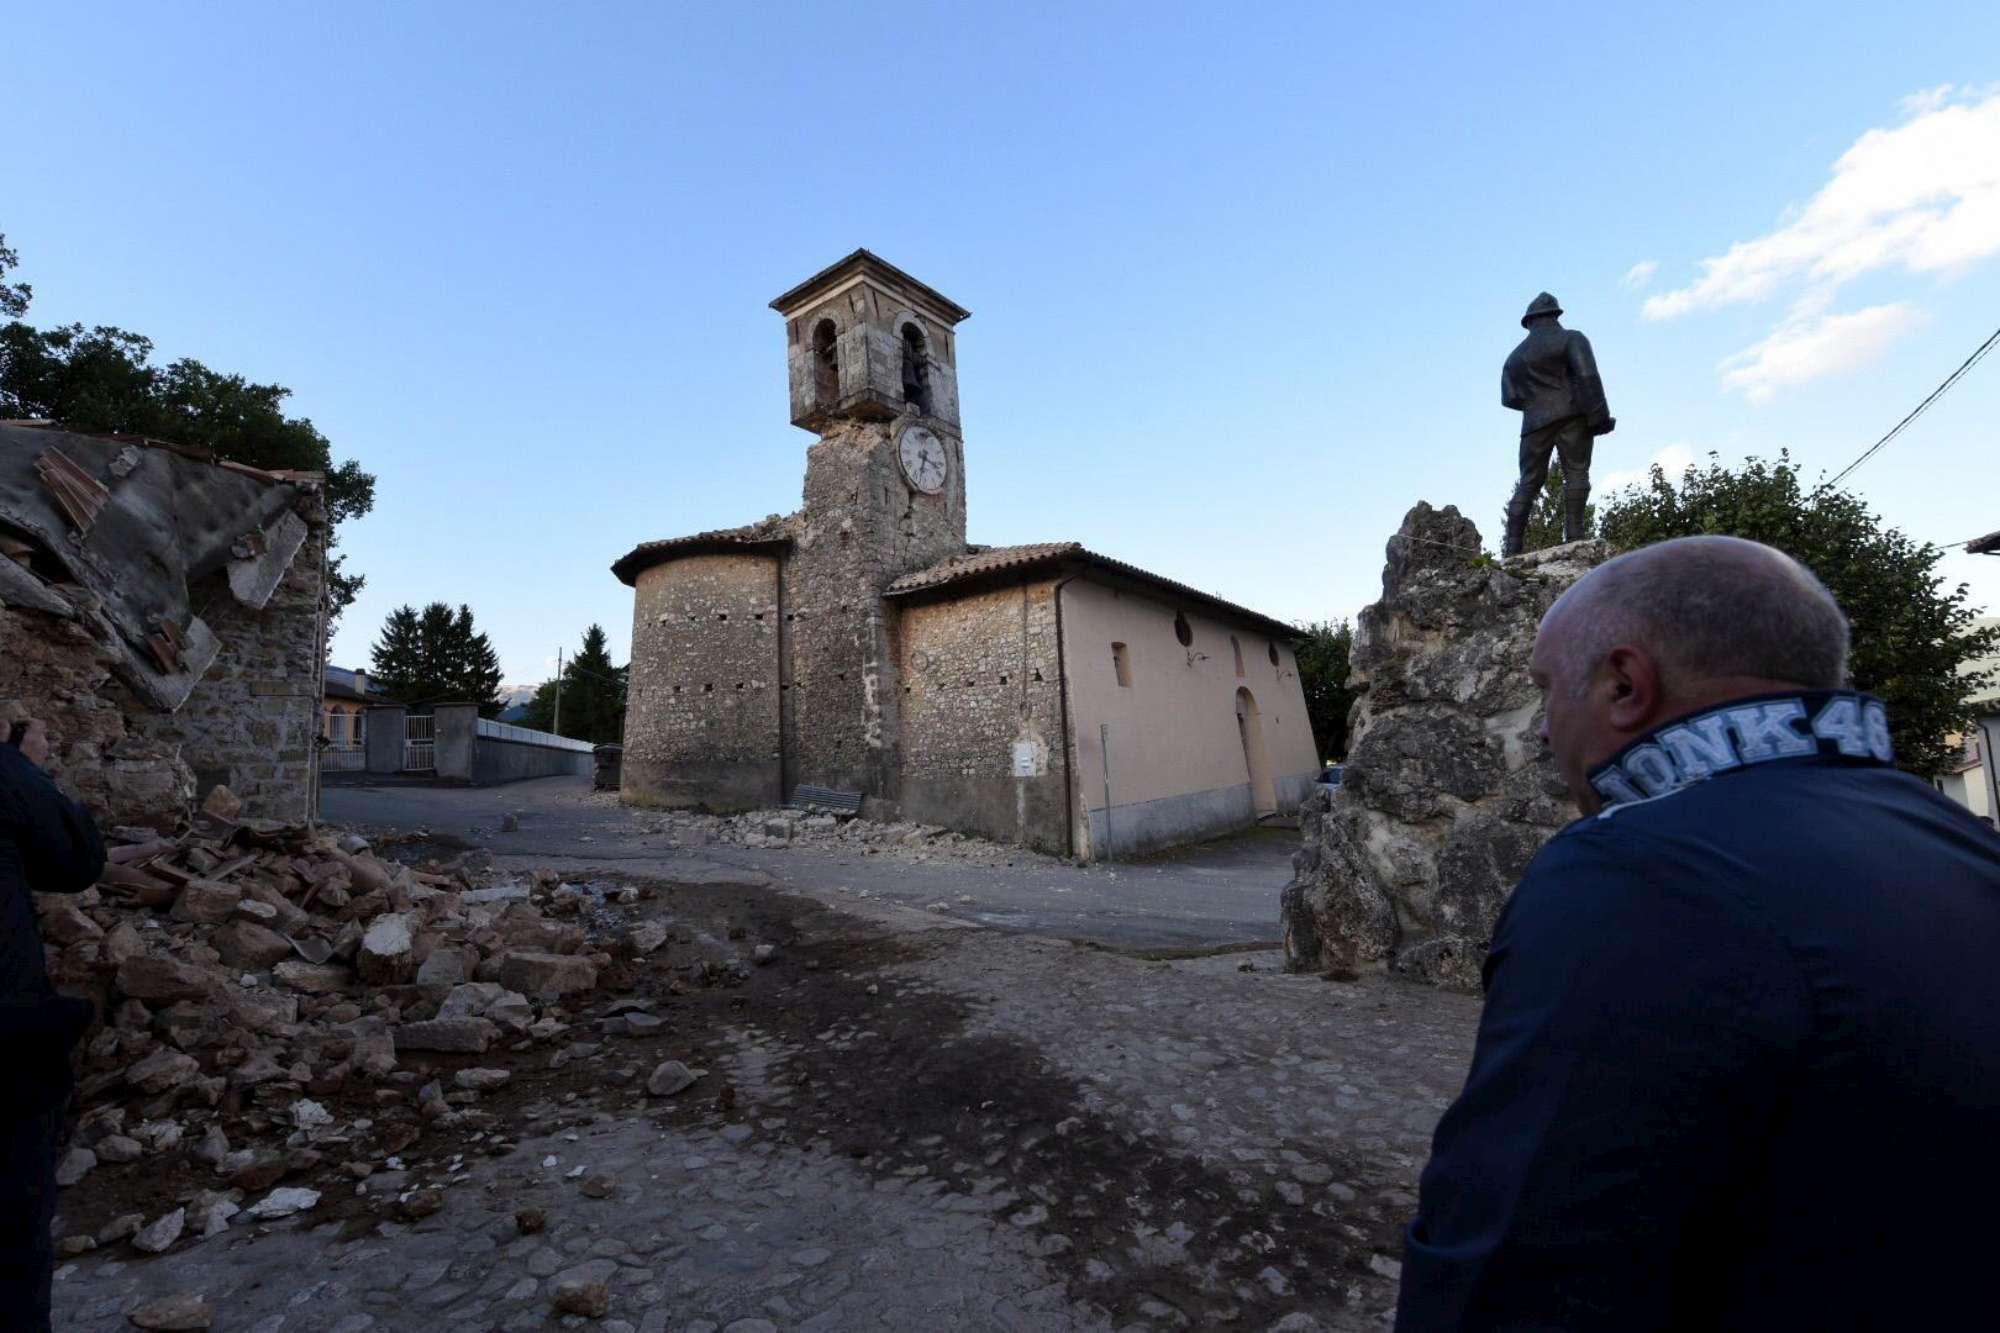 Terremoto in Centro Italia, Norcia resiste: né vittime né feriti